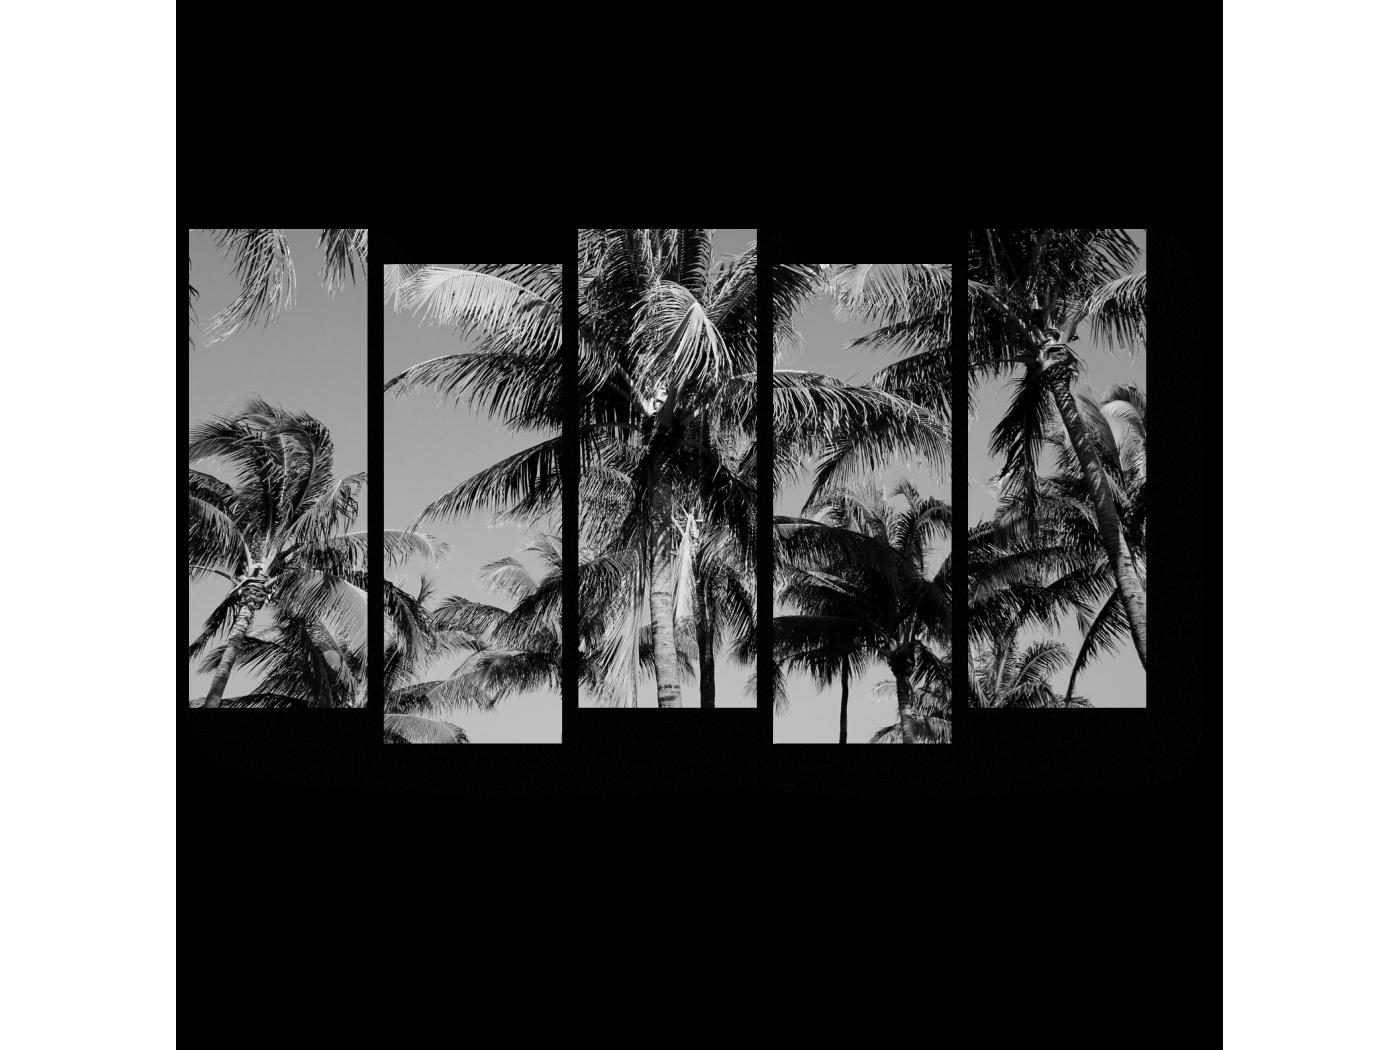 Модульная картина Жаркие тропики (90x52) фото